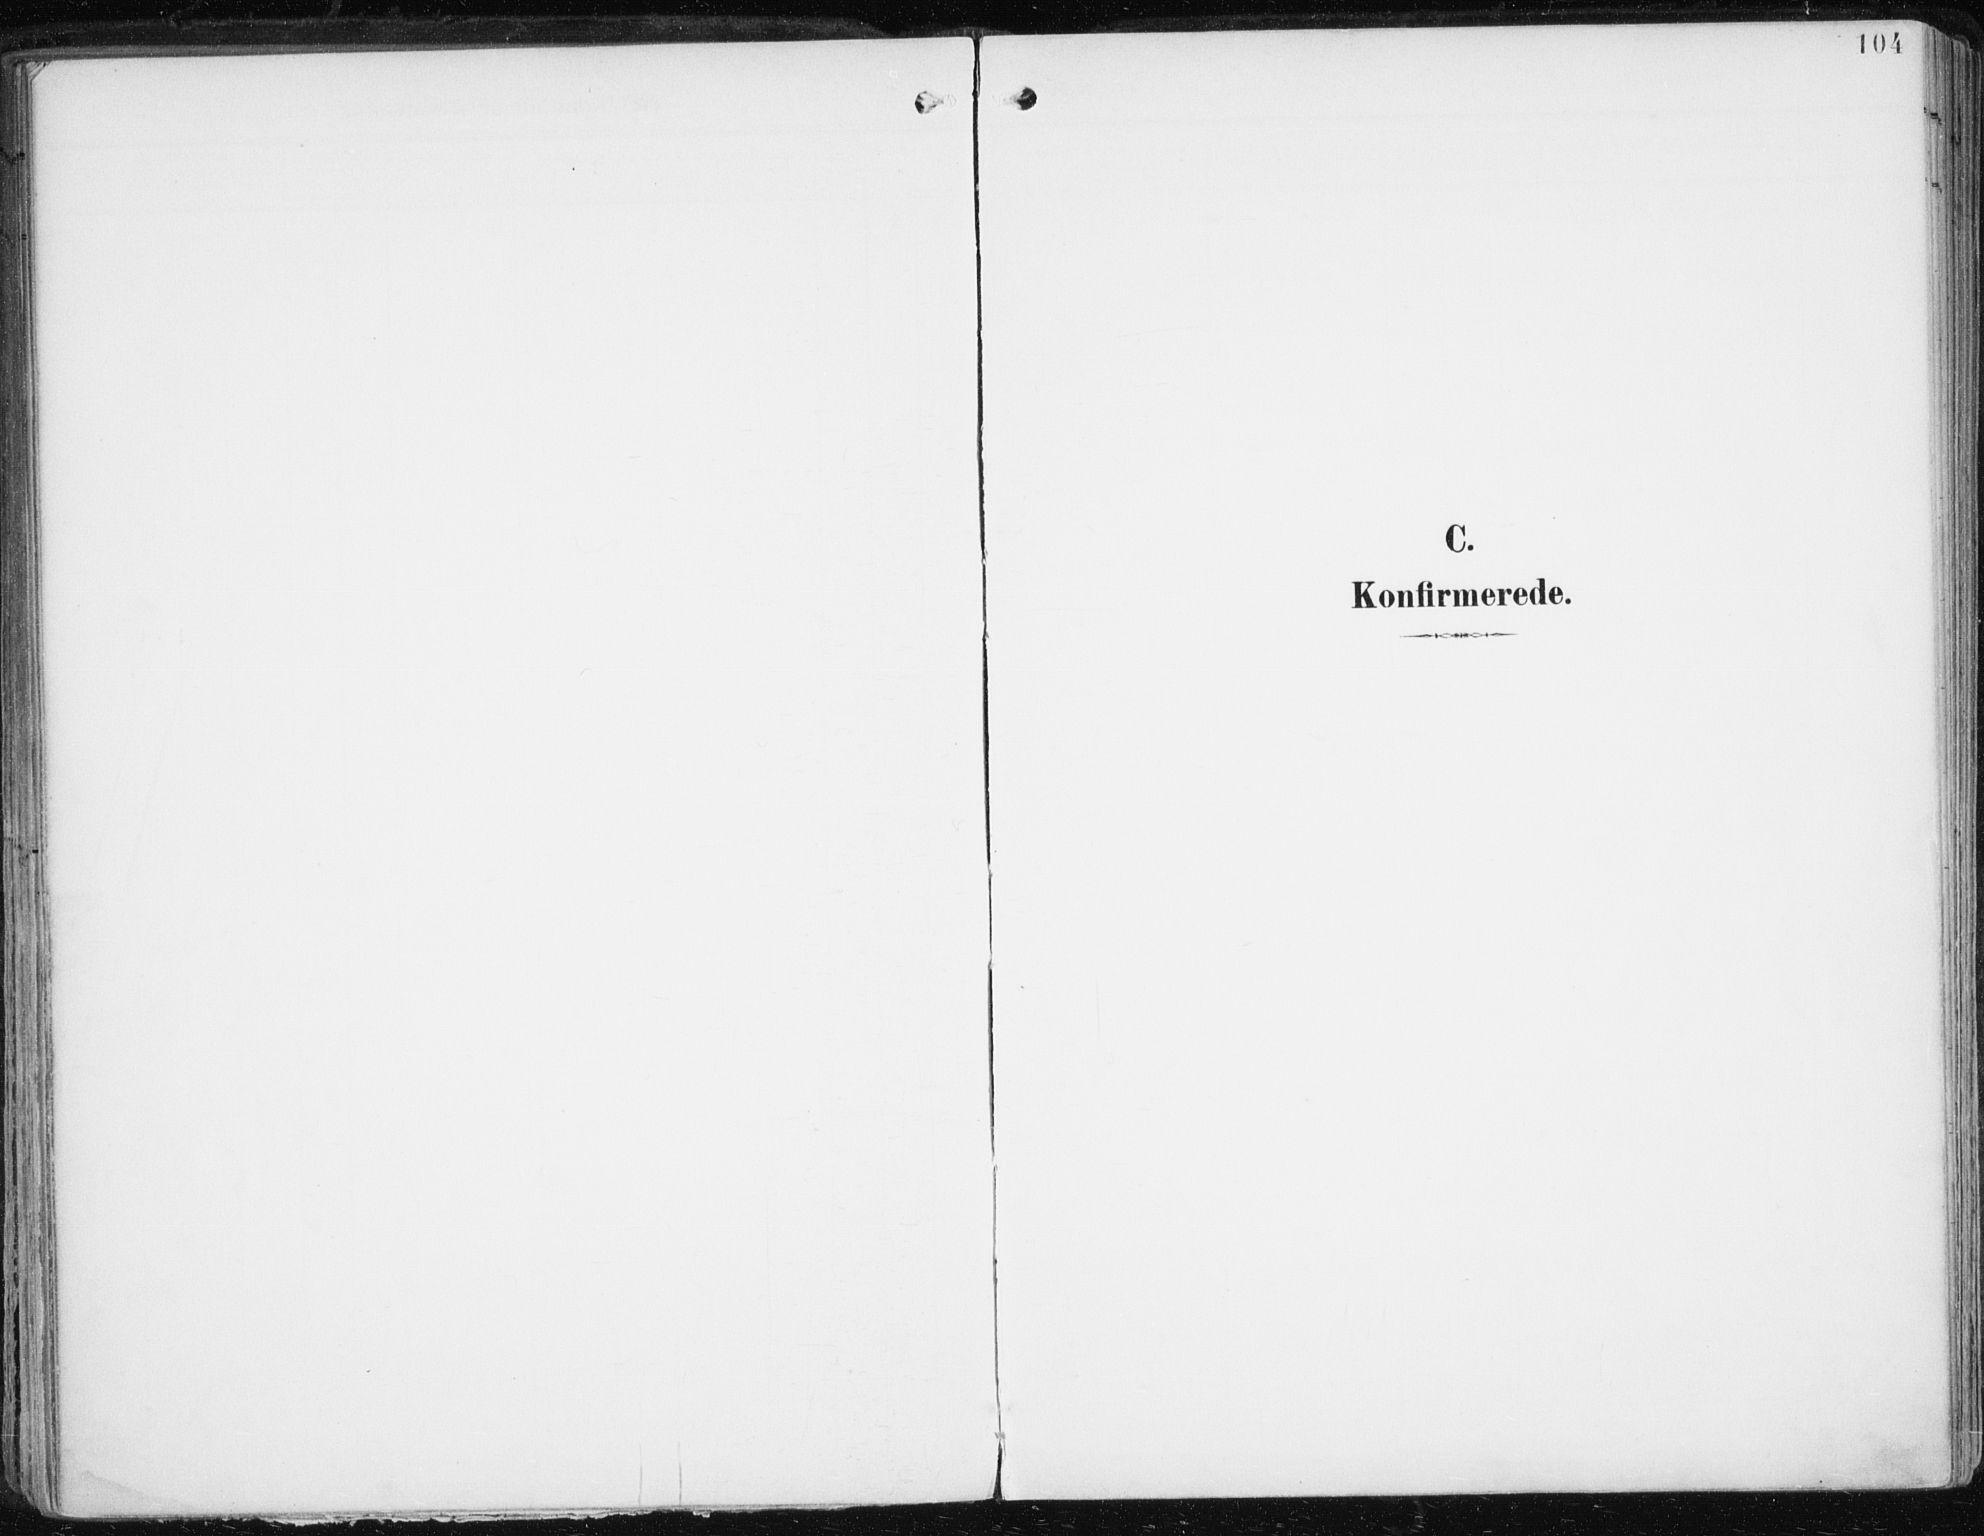 SATØ, Balsfjord sokneprestembete, Parish register (official) no. 6, 1897-1909, p. 104